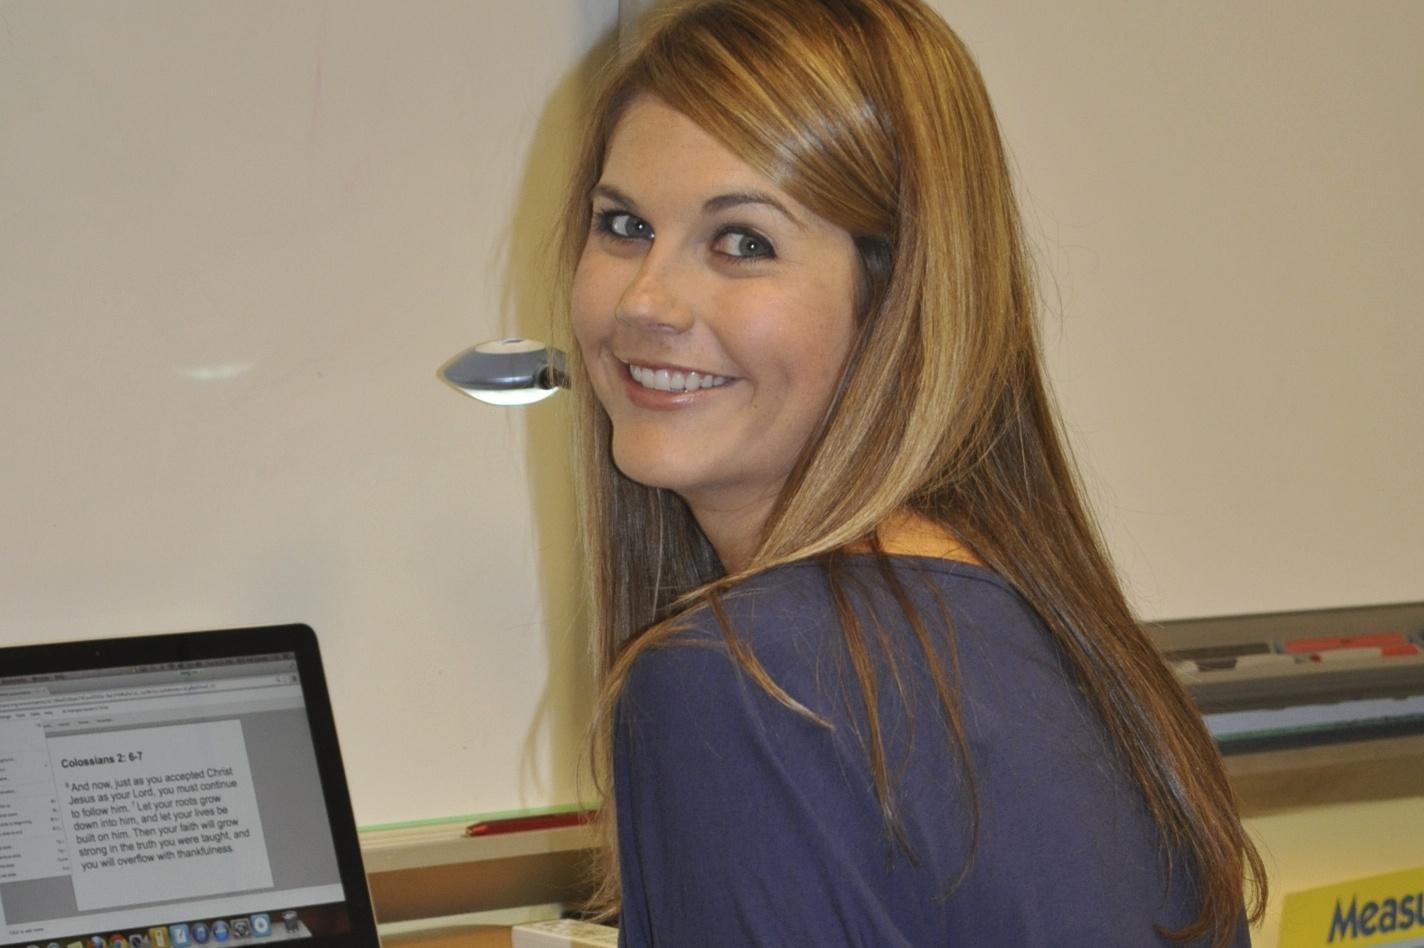 Smiling Teachers